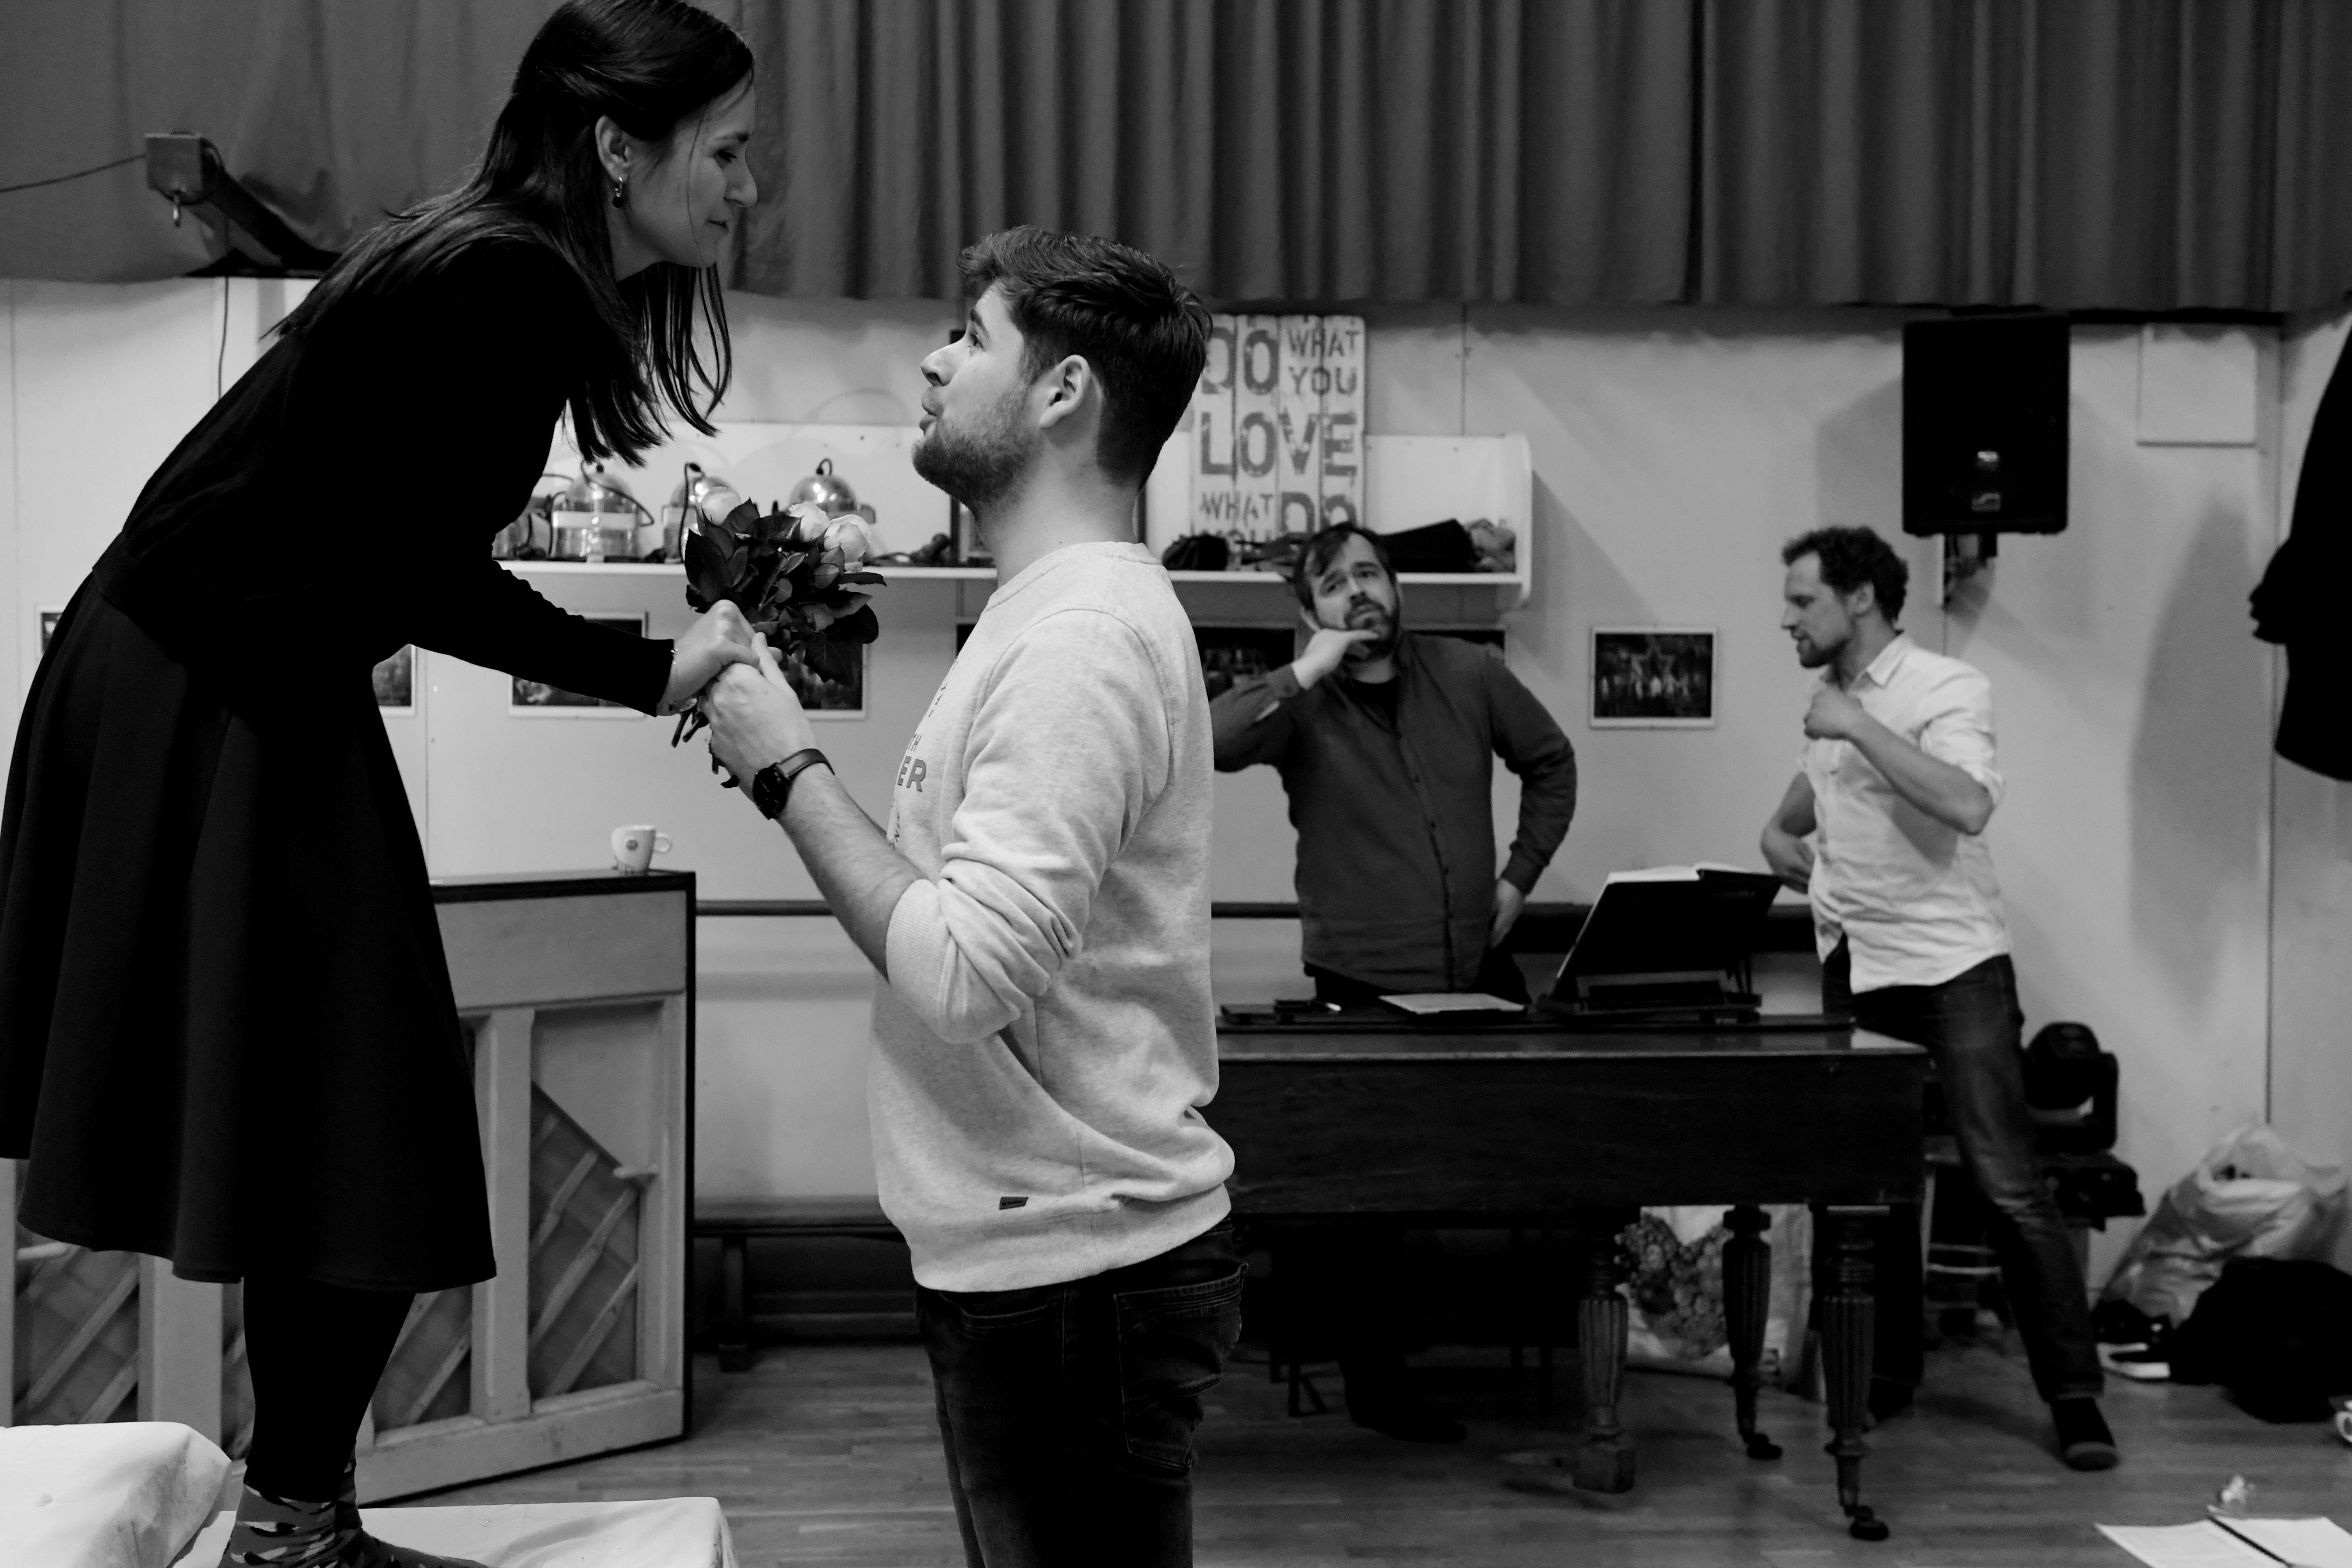 Don Giovanni in creatie - vlnr: Judith Weusten (Zerlina) - Fabian Homburg (Masetto) - Stijn Saveniers (dirigent) - Sybrand van der Werf (regisseur)